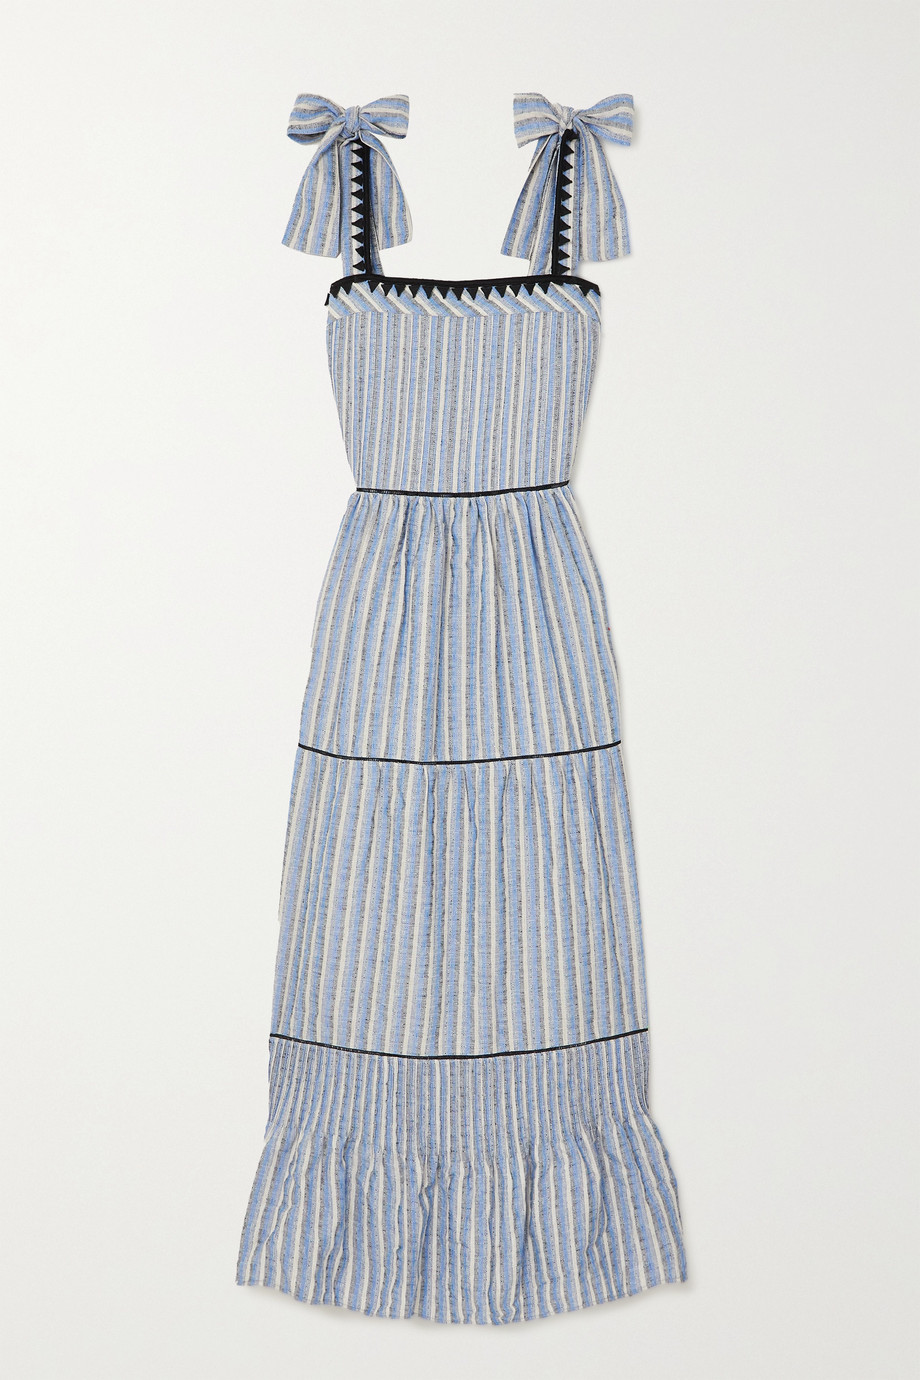 Lug Von Siga Ornella bow-detailed tiered striped jacquard maxi dress